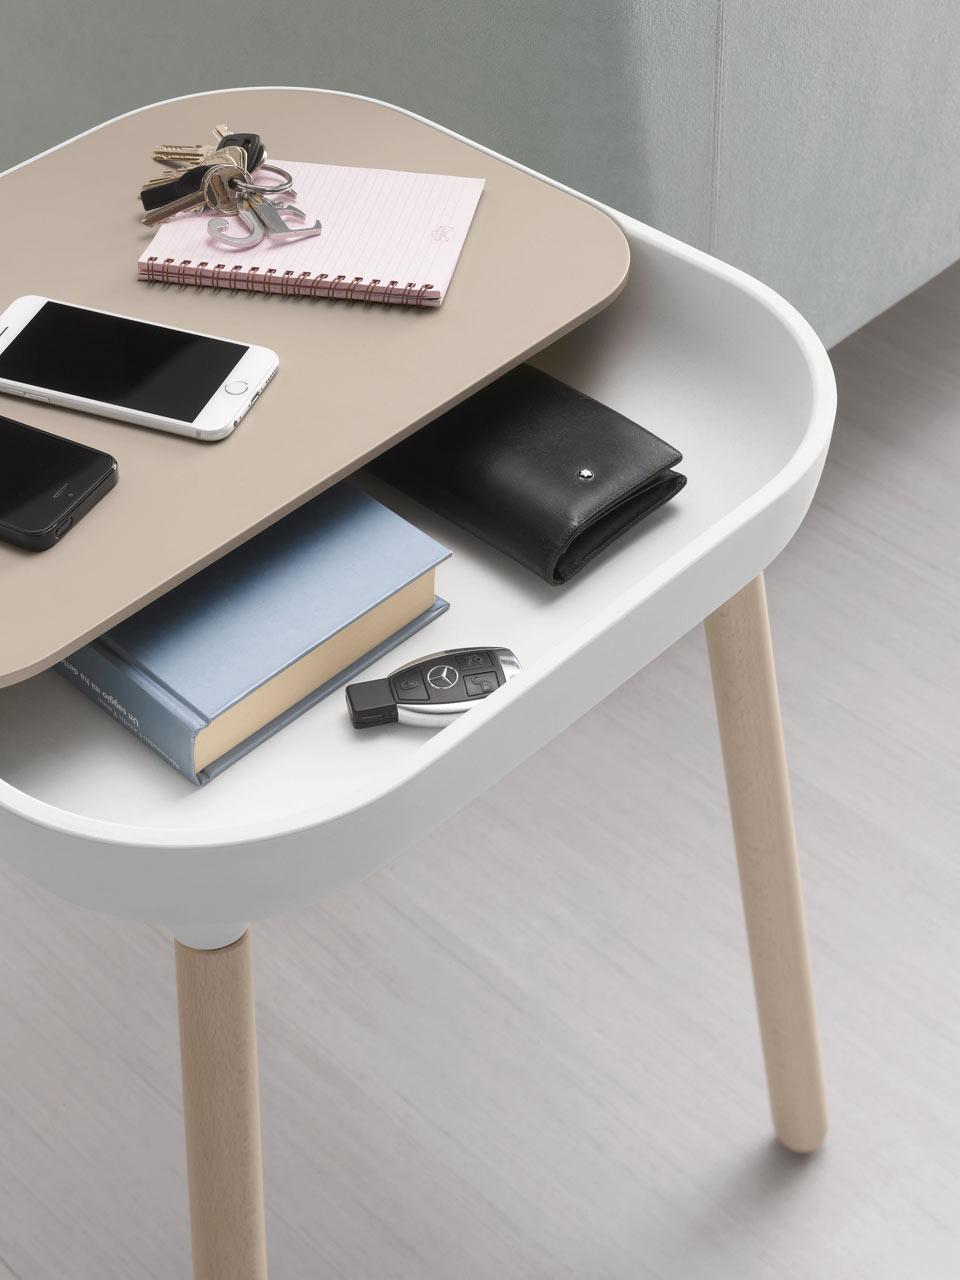 App-Side-Table-hisheji (5)